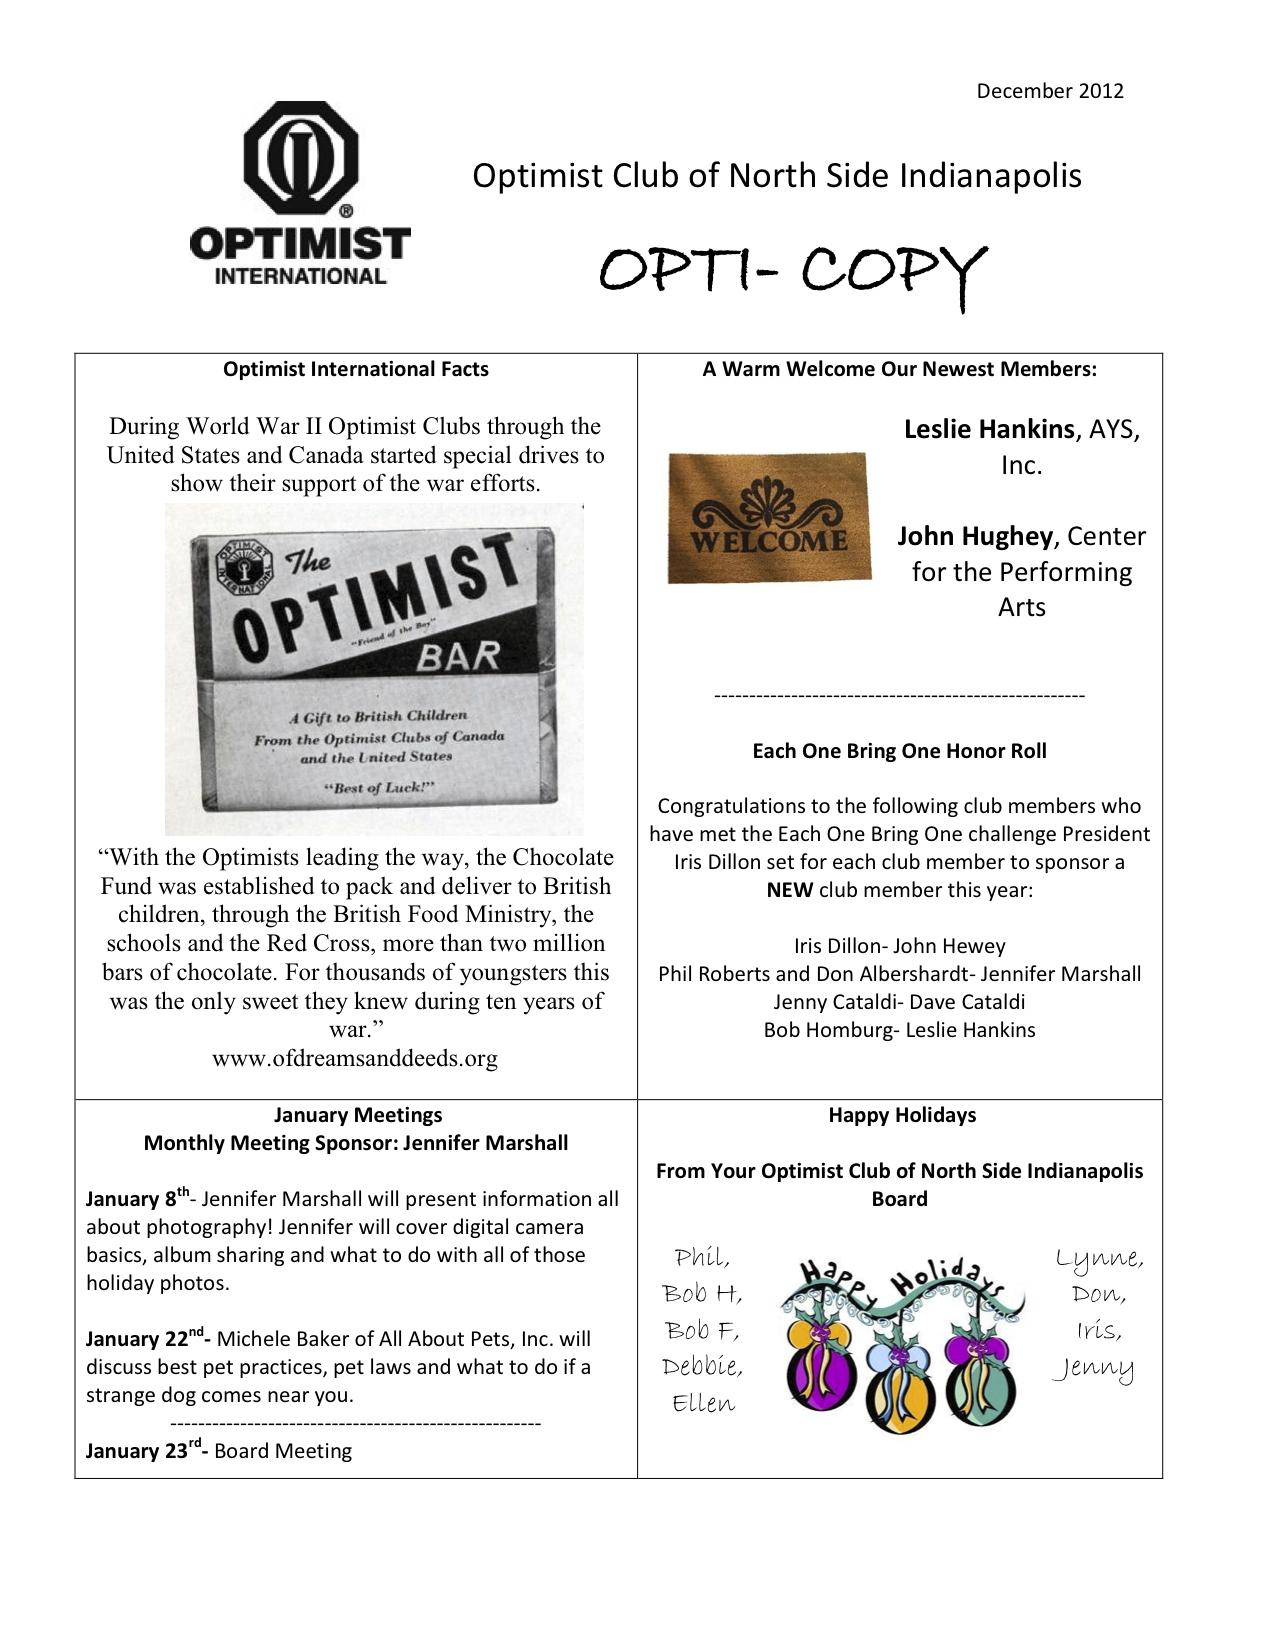 OptiCopy 2012-12 a